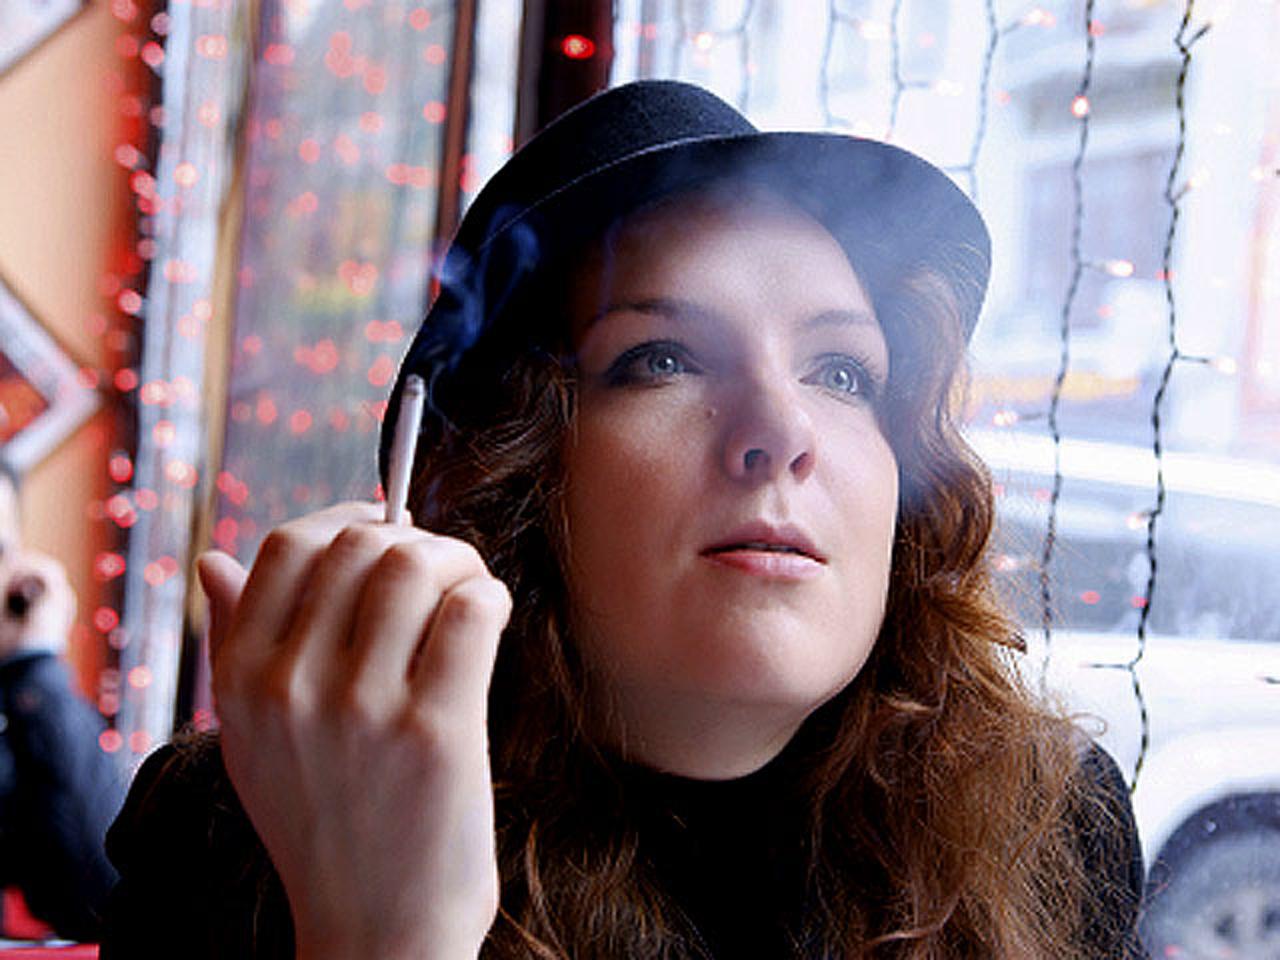 Peer pressure biggest influence on teen smokers: study